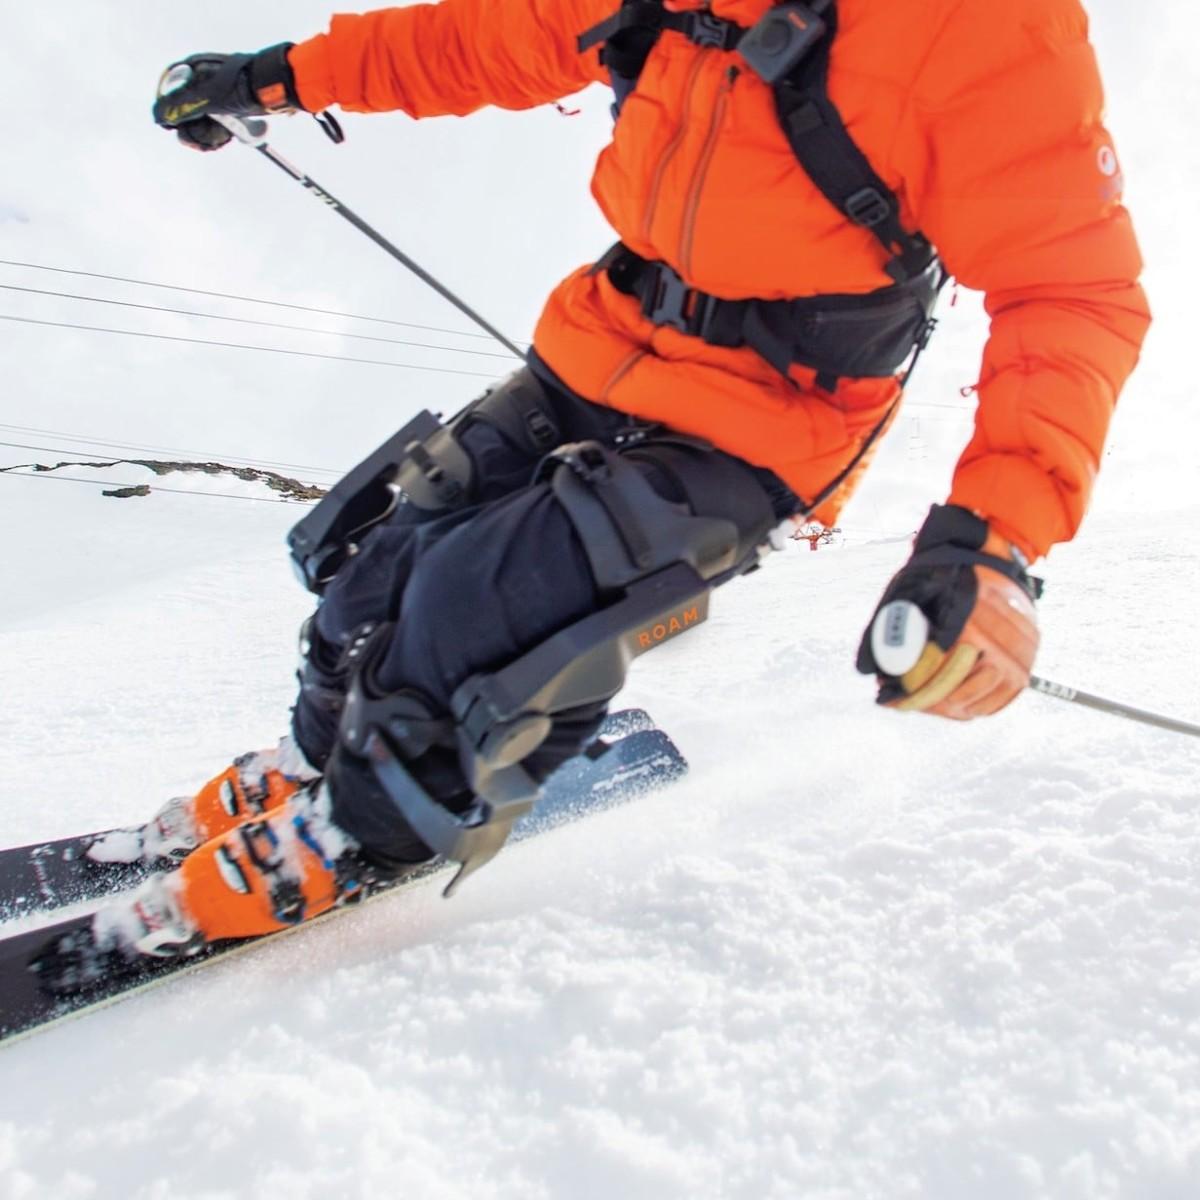 Roam Elevate Robotic Ski Exoskeleton lets you ski the slopes for longer